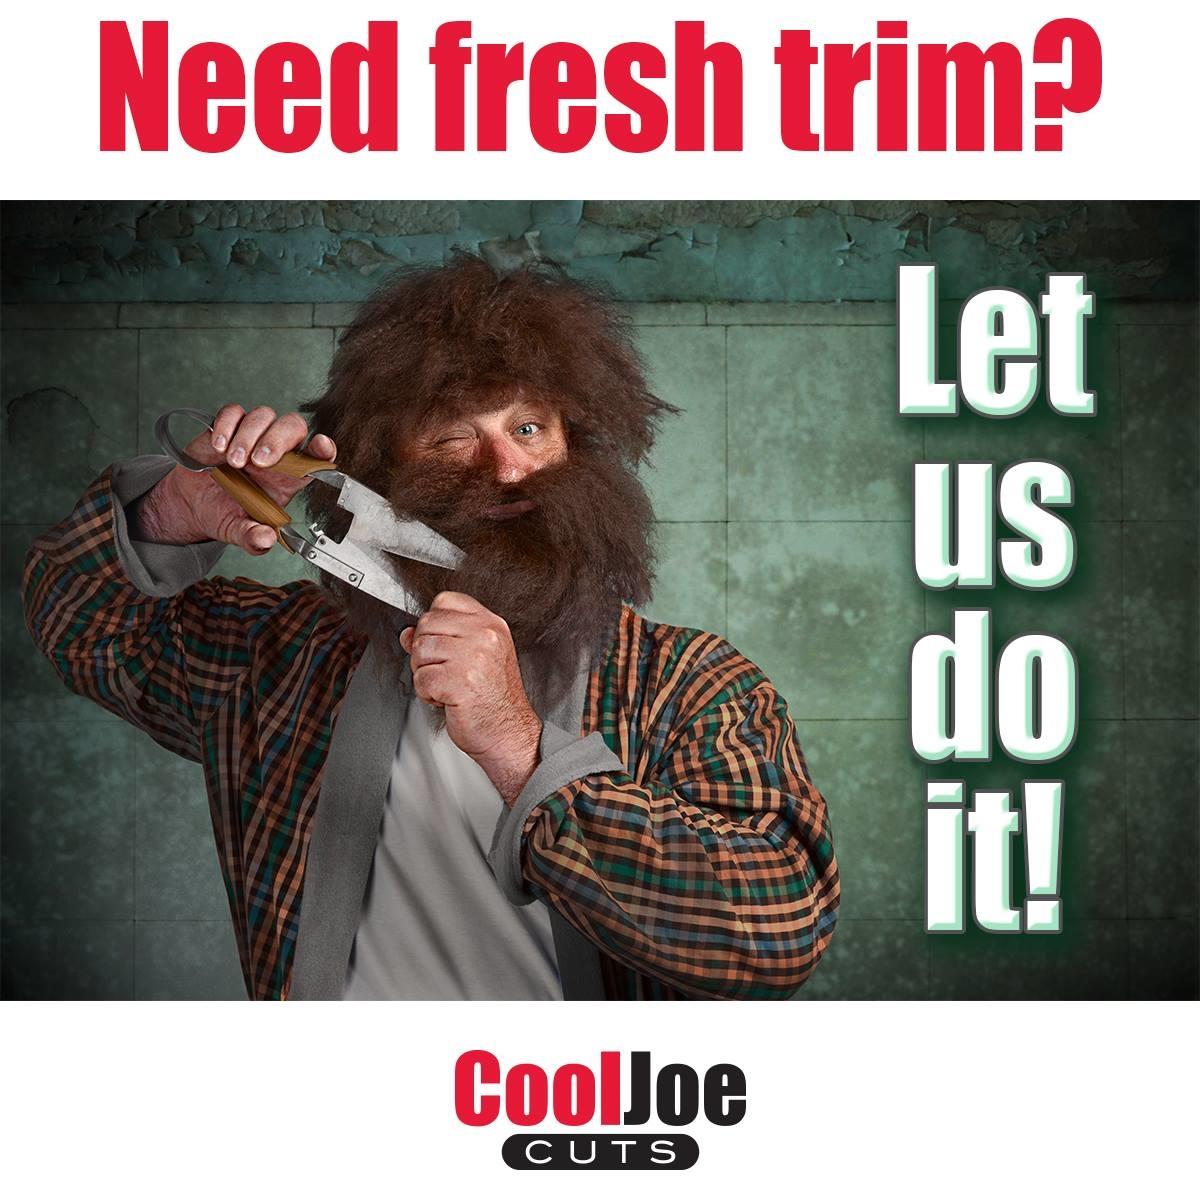 Cool Joe Cuts - Sean Haggerty image 2